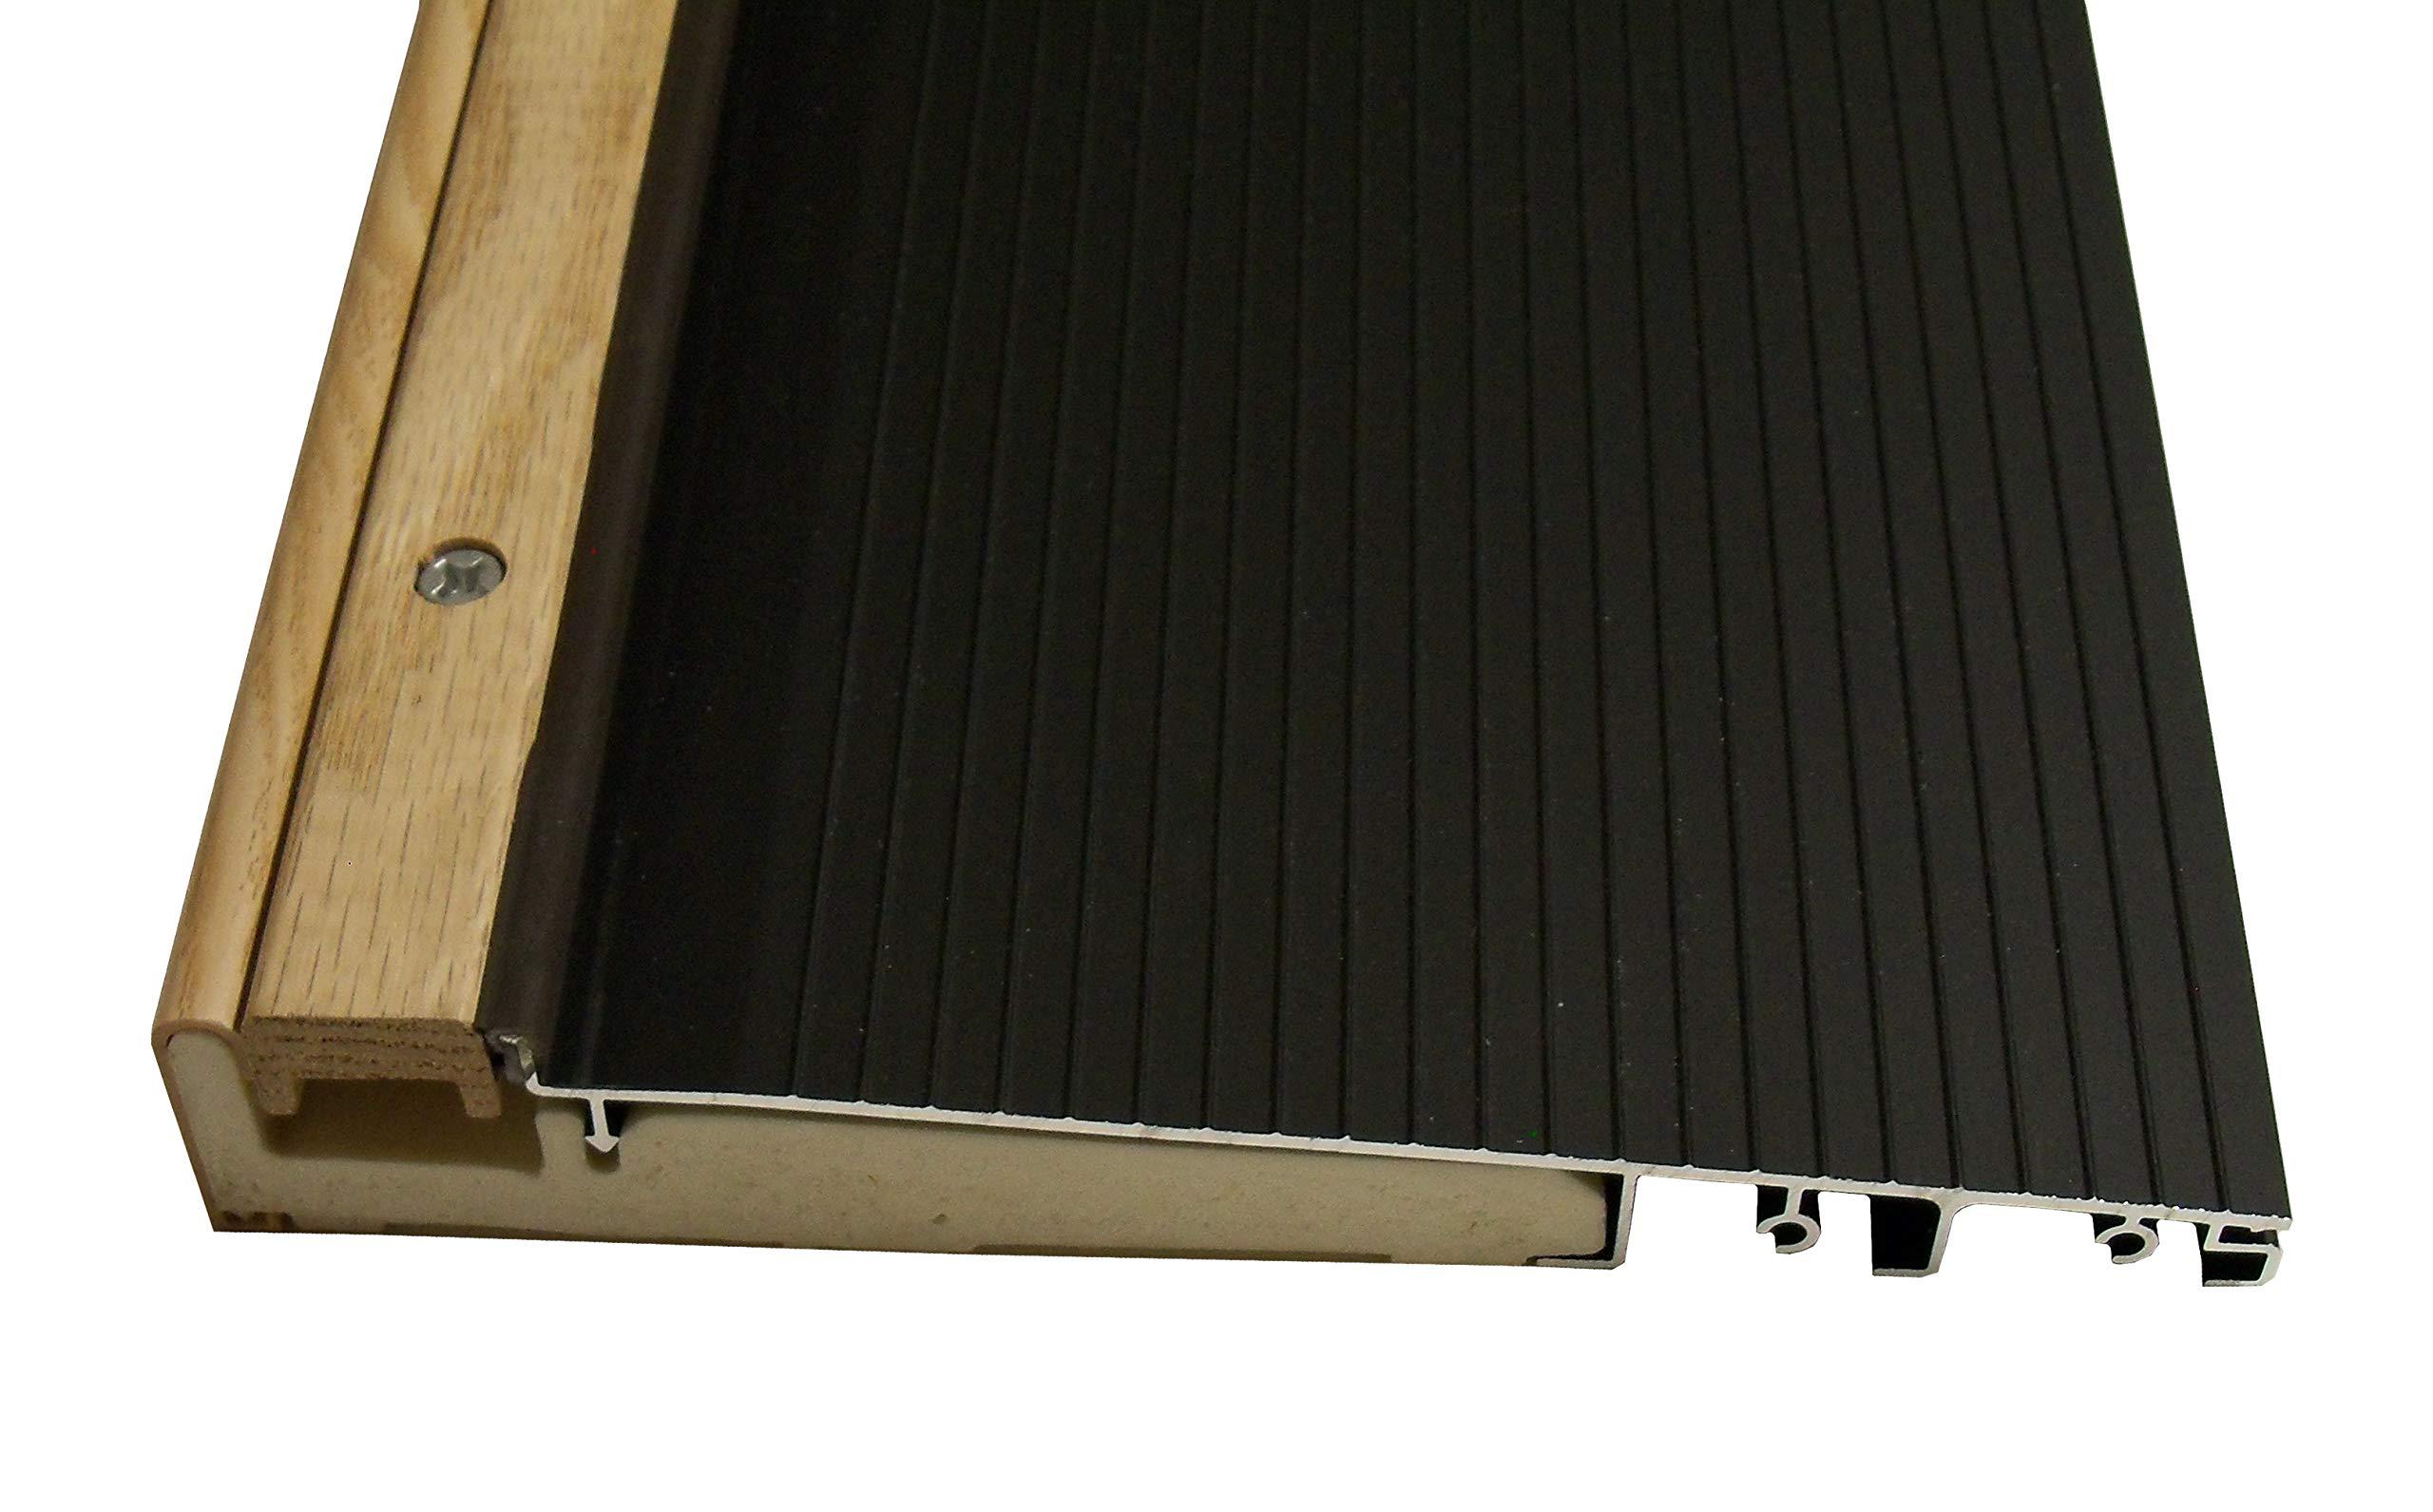 Exterior Inswing Threshold 7 13/16 inch x 72 inches in Dark Bronze